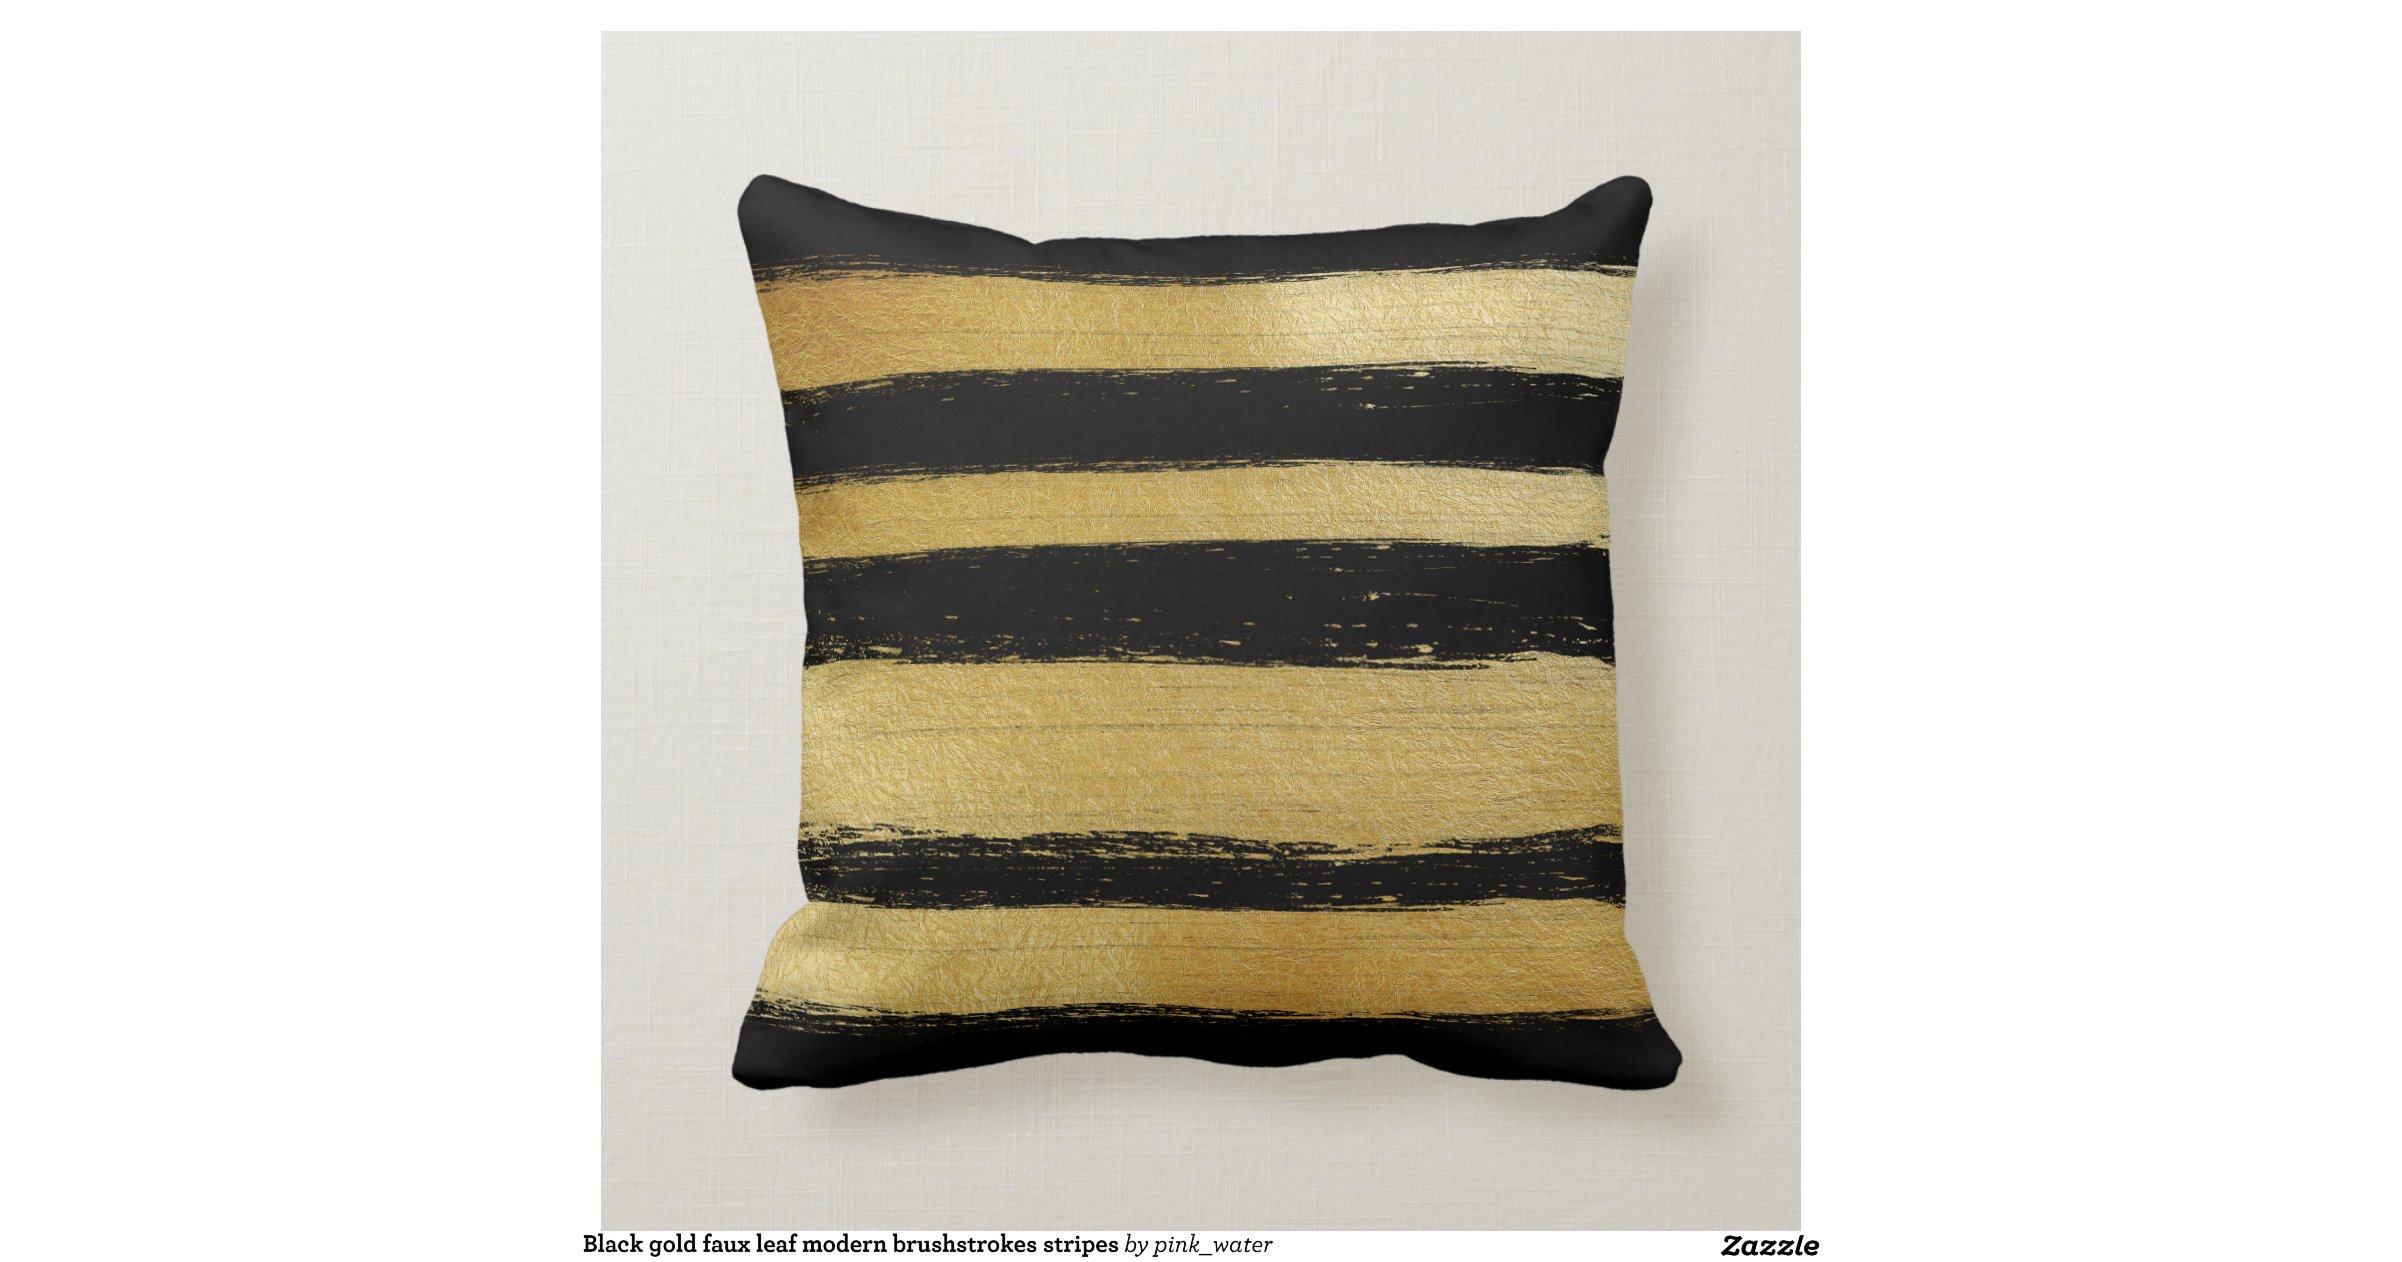 black_gold_faux_leaf_modern_brushstrokes_stripes_pillow-r943eae2714cb49868c5553336a10c608_i5f0b ...